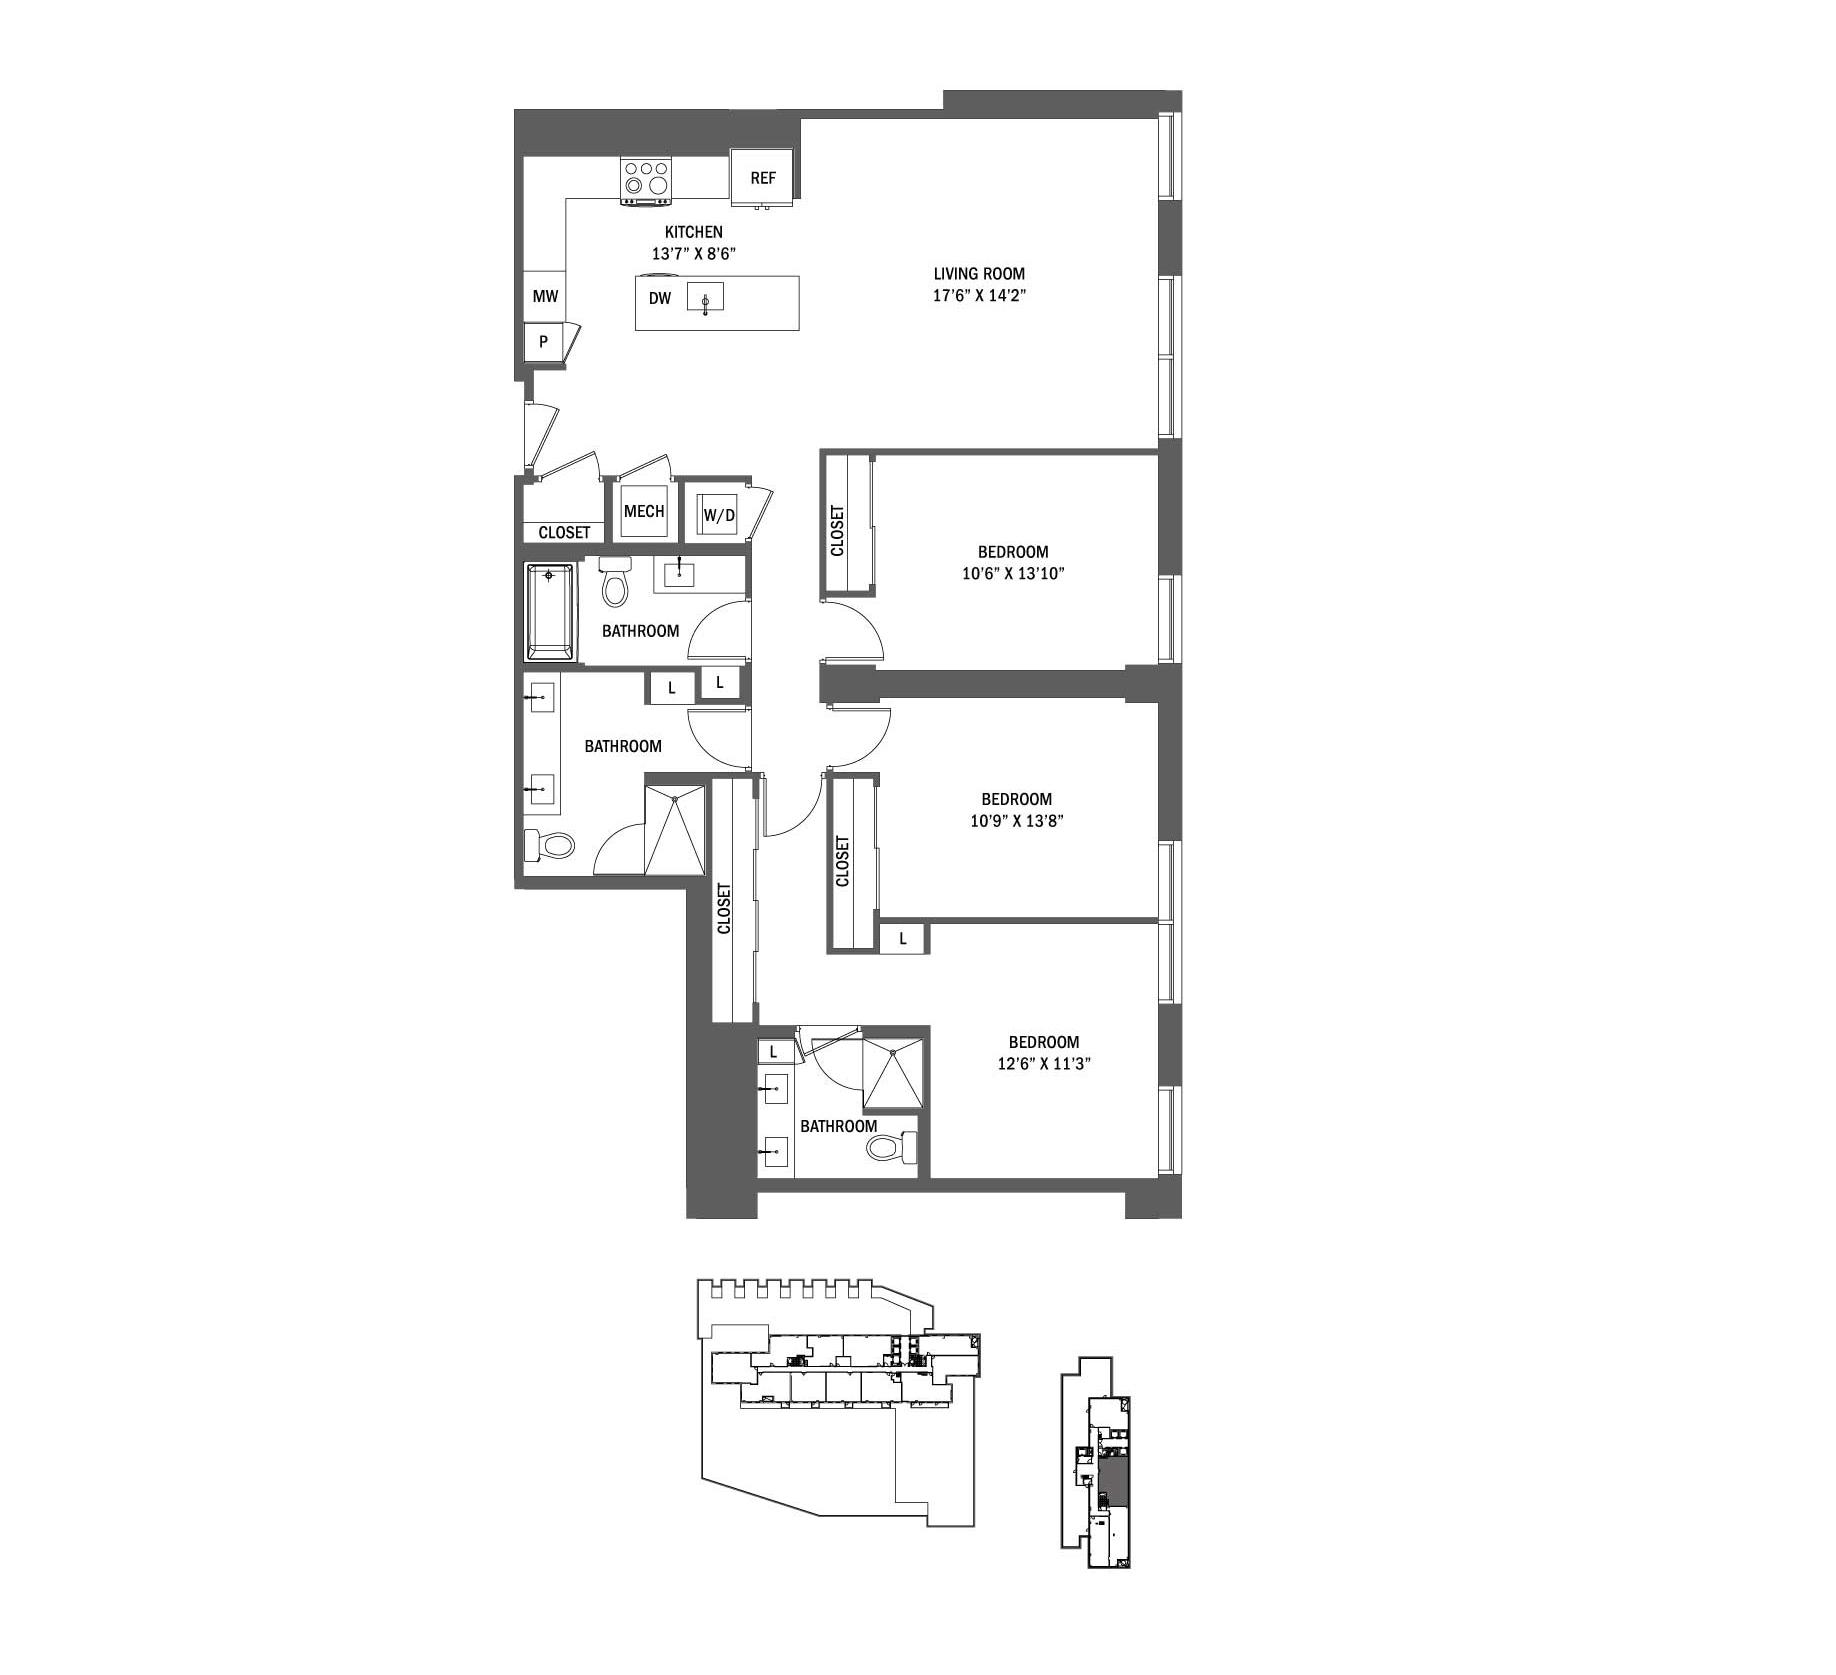 P0625338 789cc03 e12 php 2 floorplan